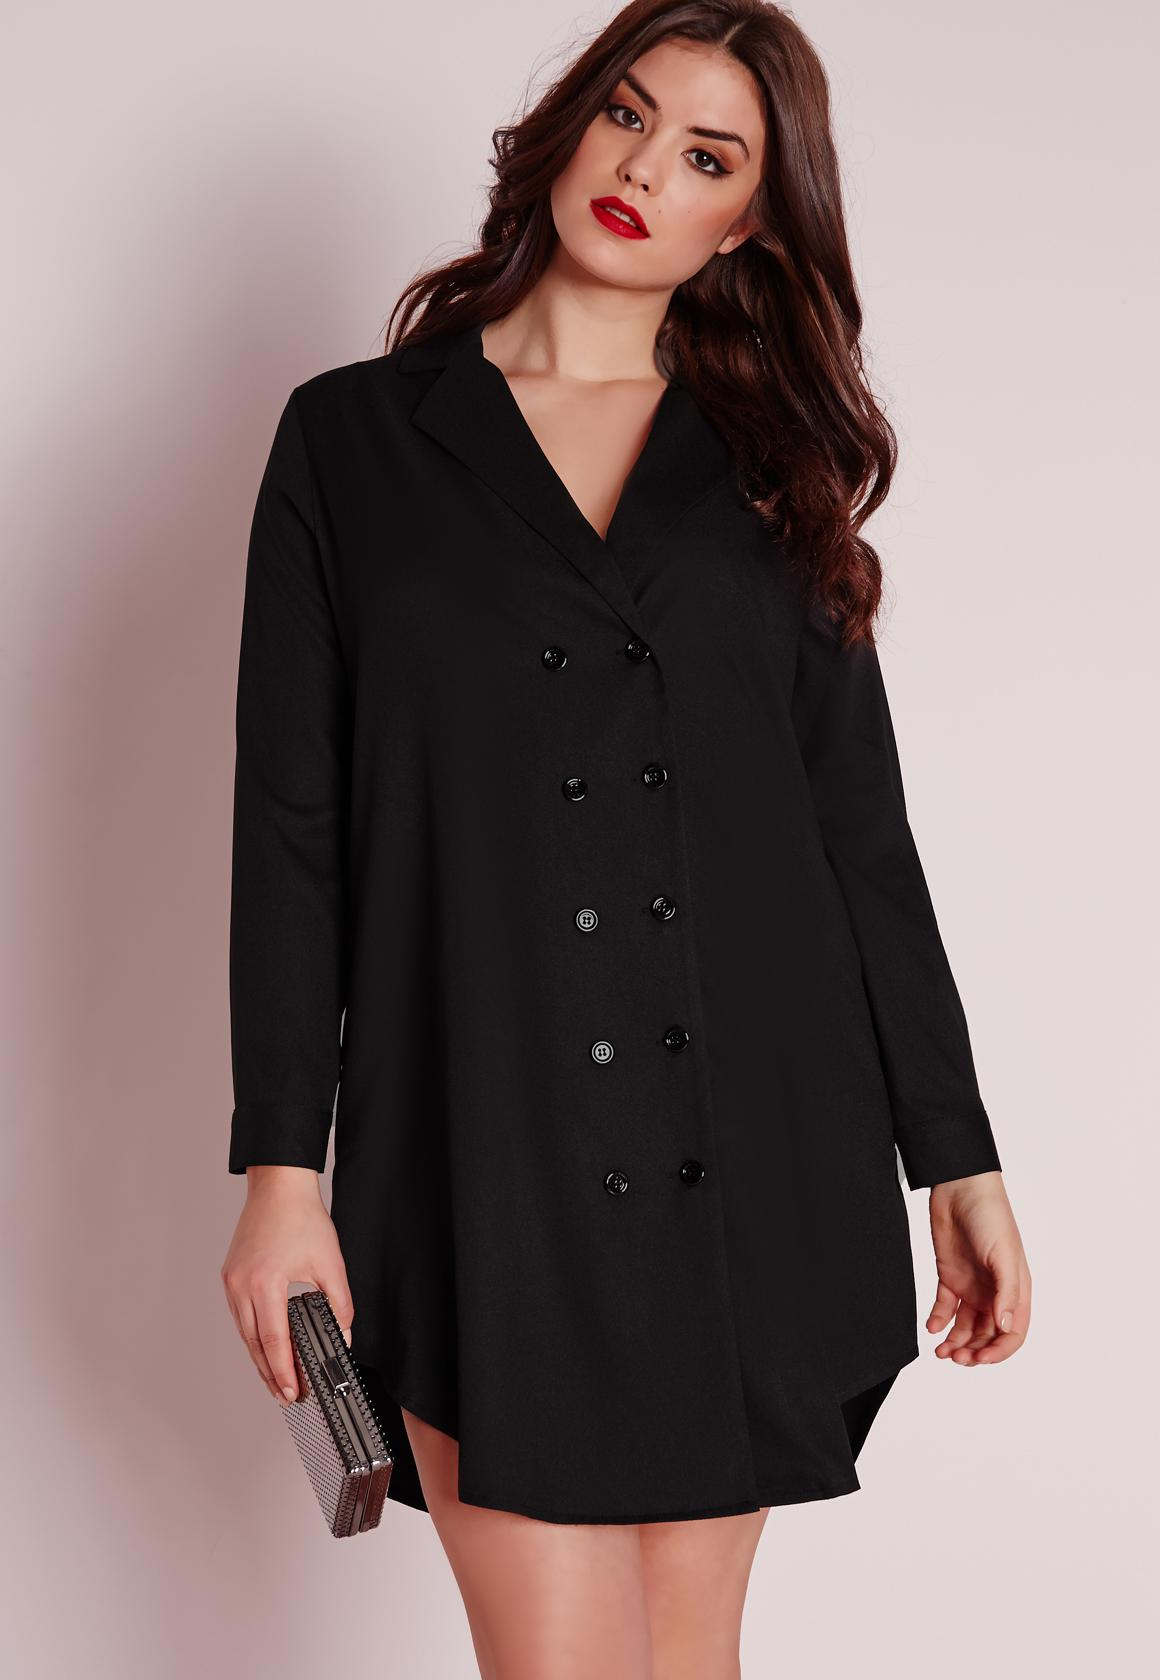 0336b0cd86eab Plus Size Tux Shirt Dress Black